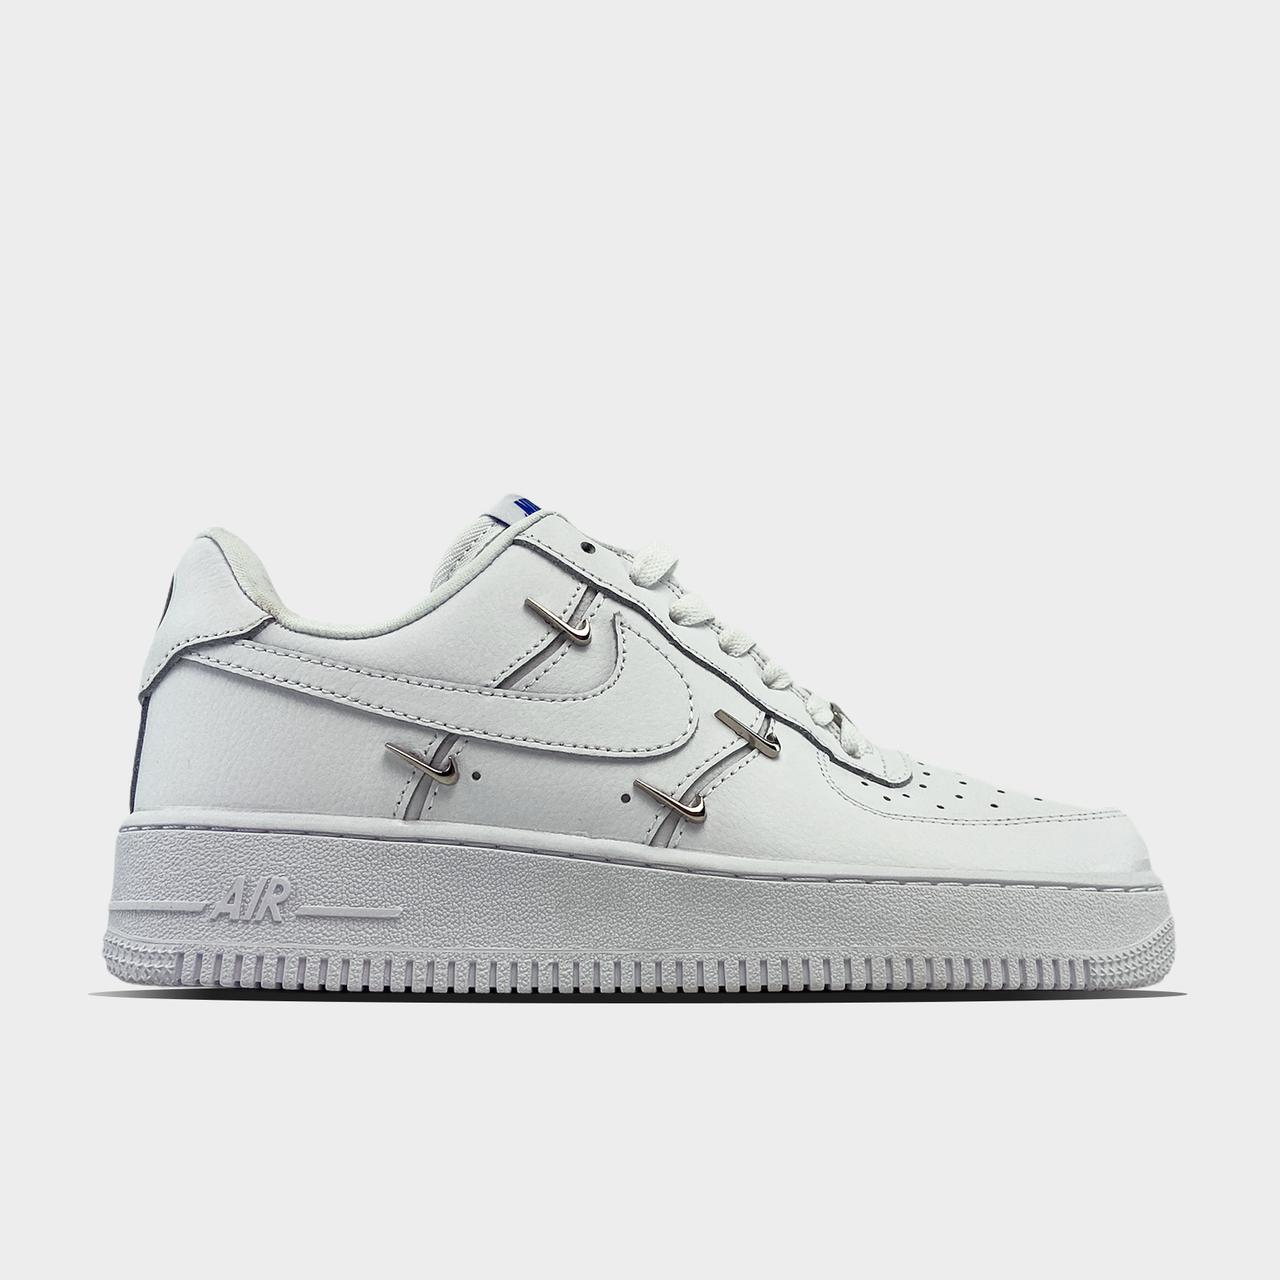 Nike Air Force 1 LX Chrome Swooshes White (Білий)